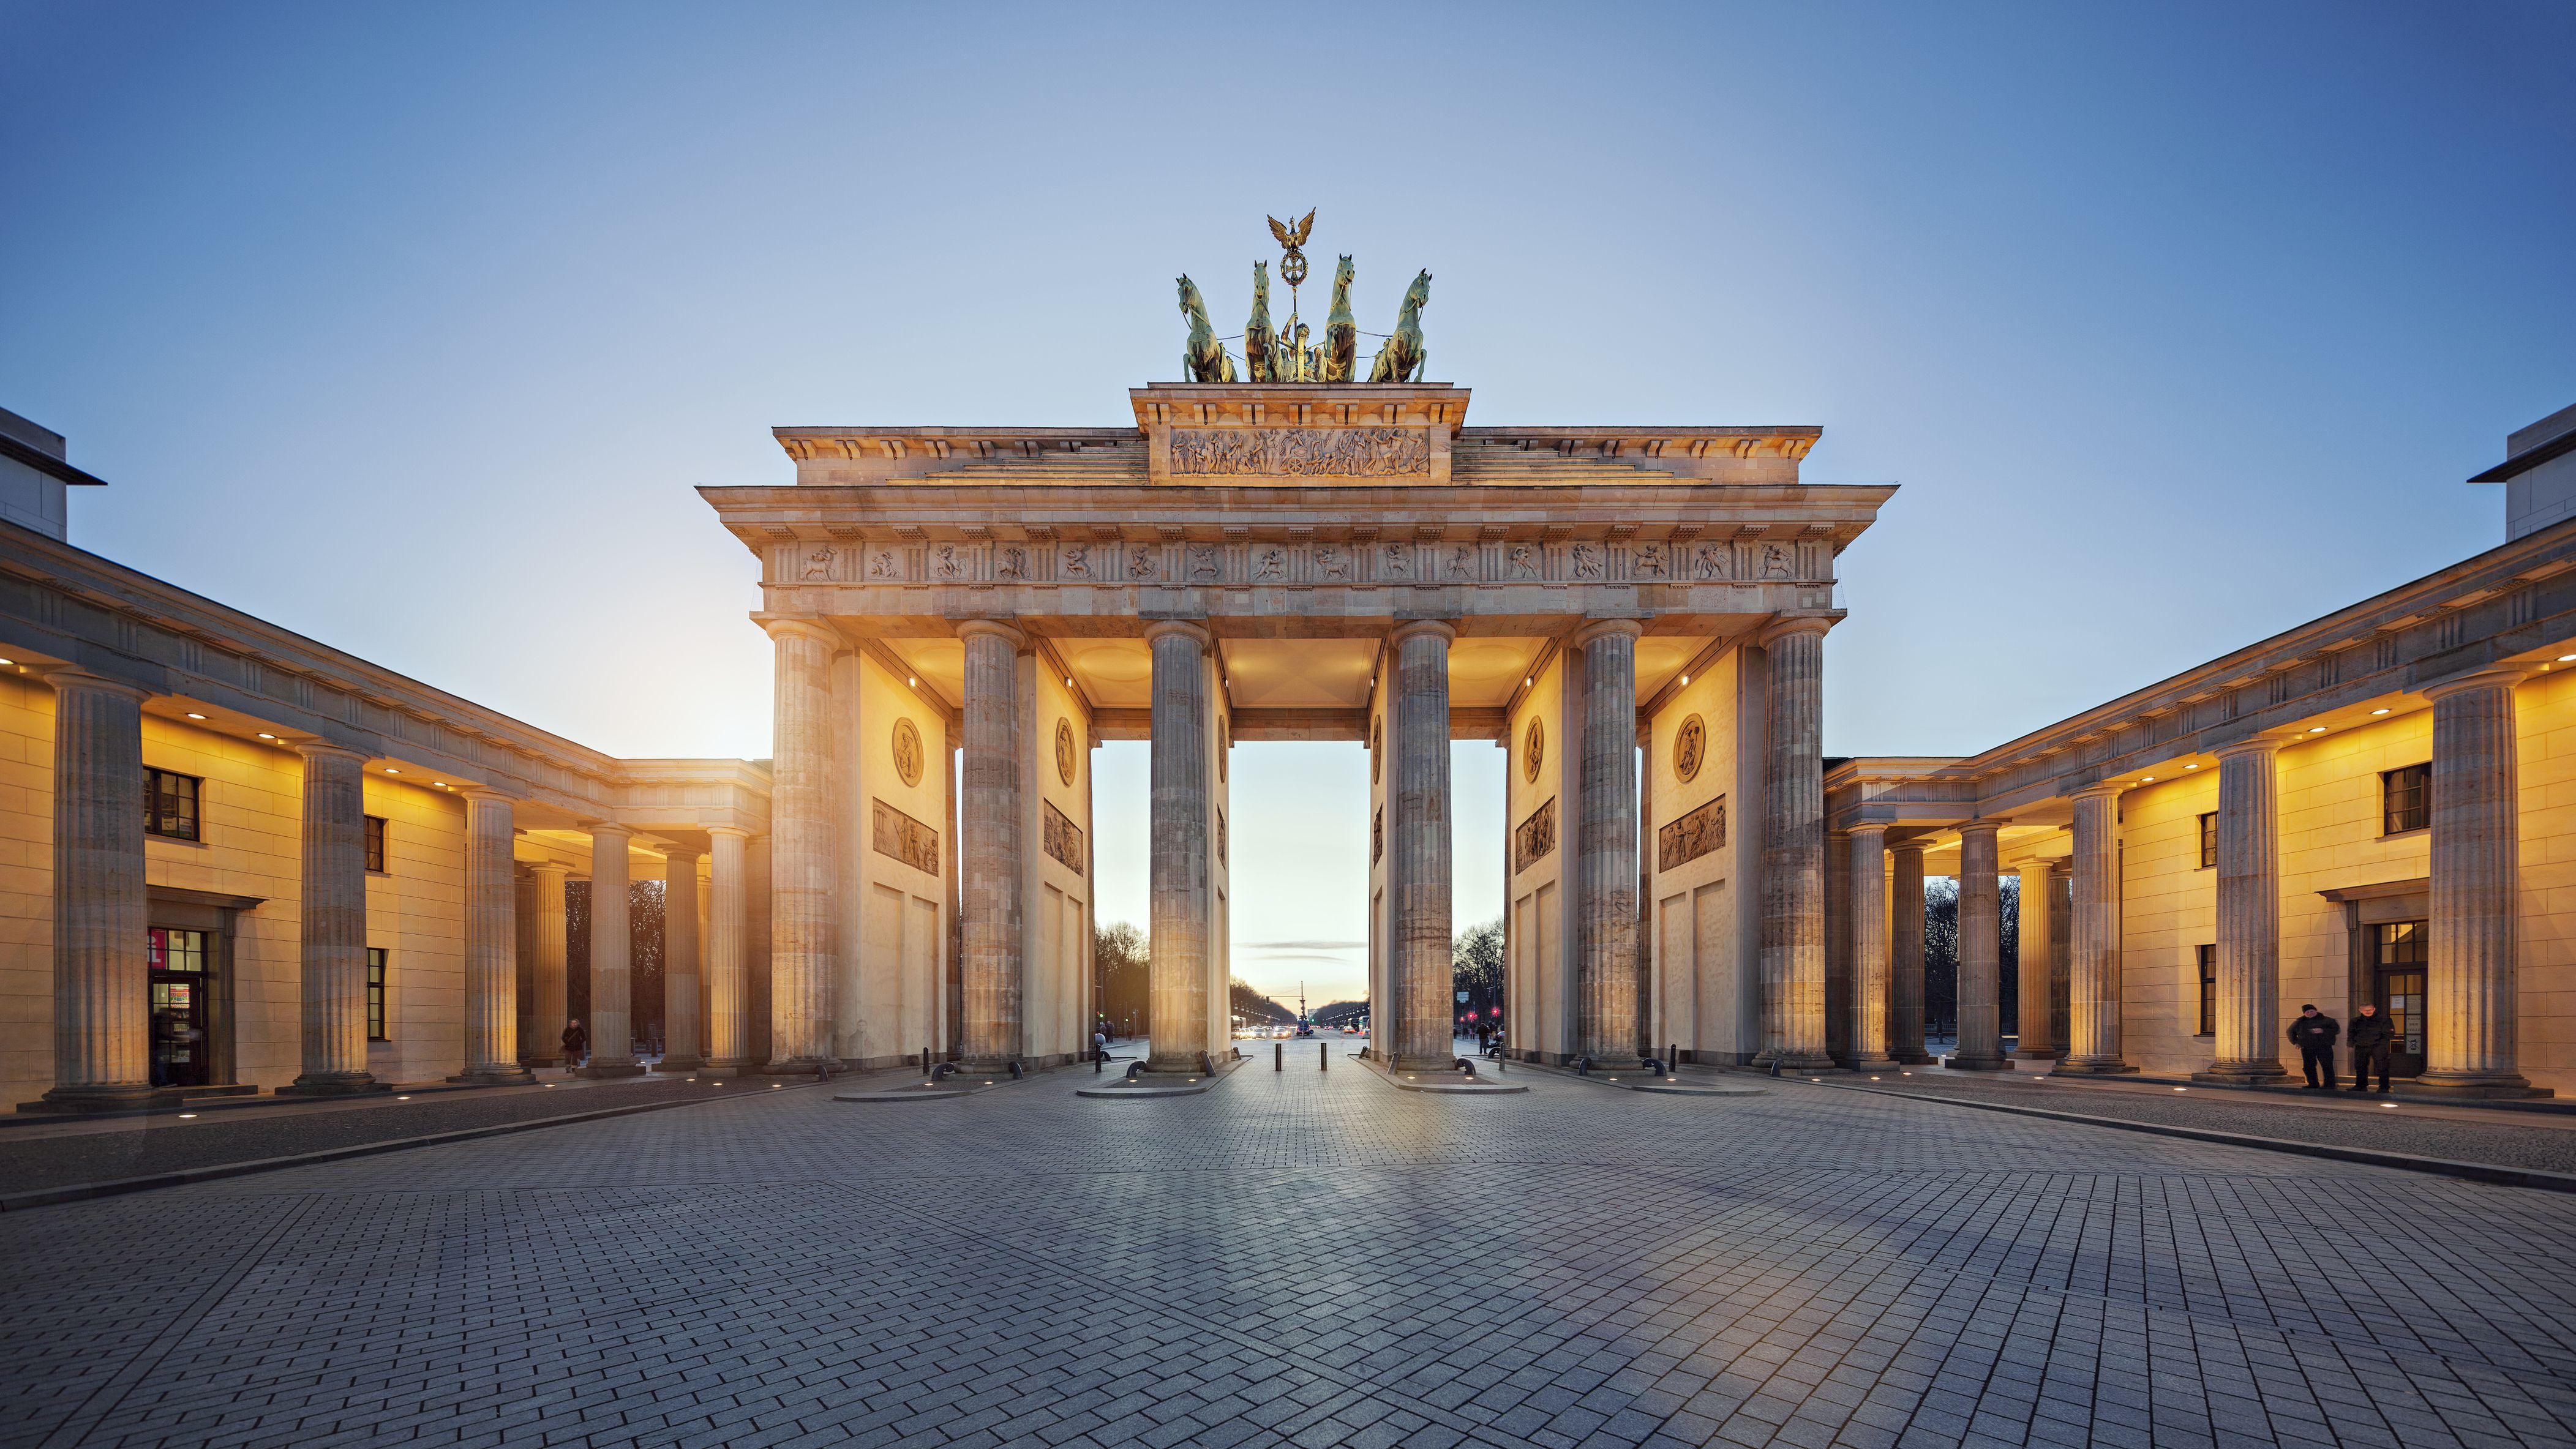 Brandenburg Gate at sunset